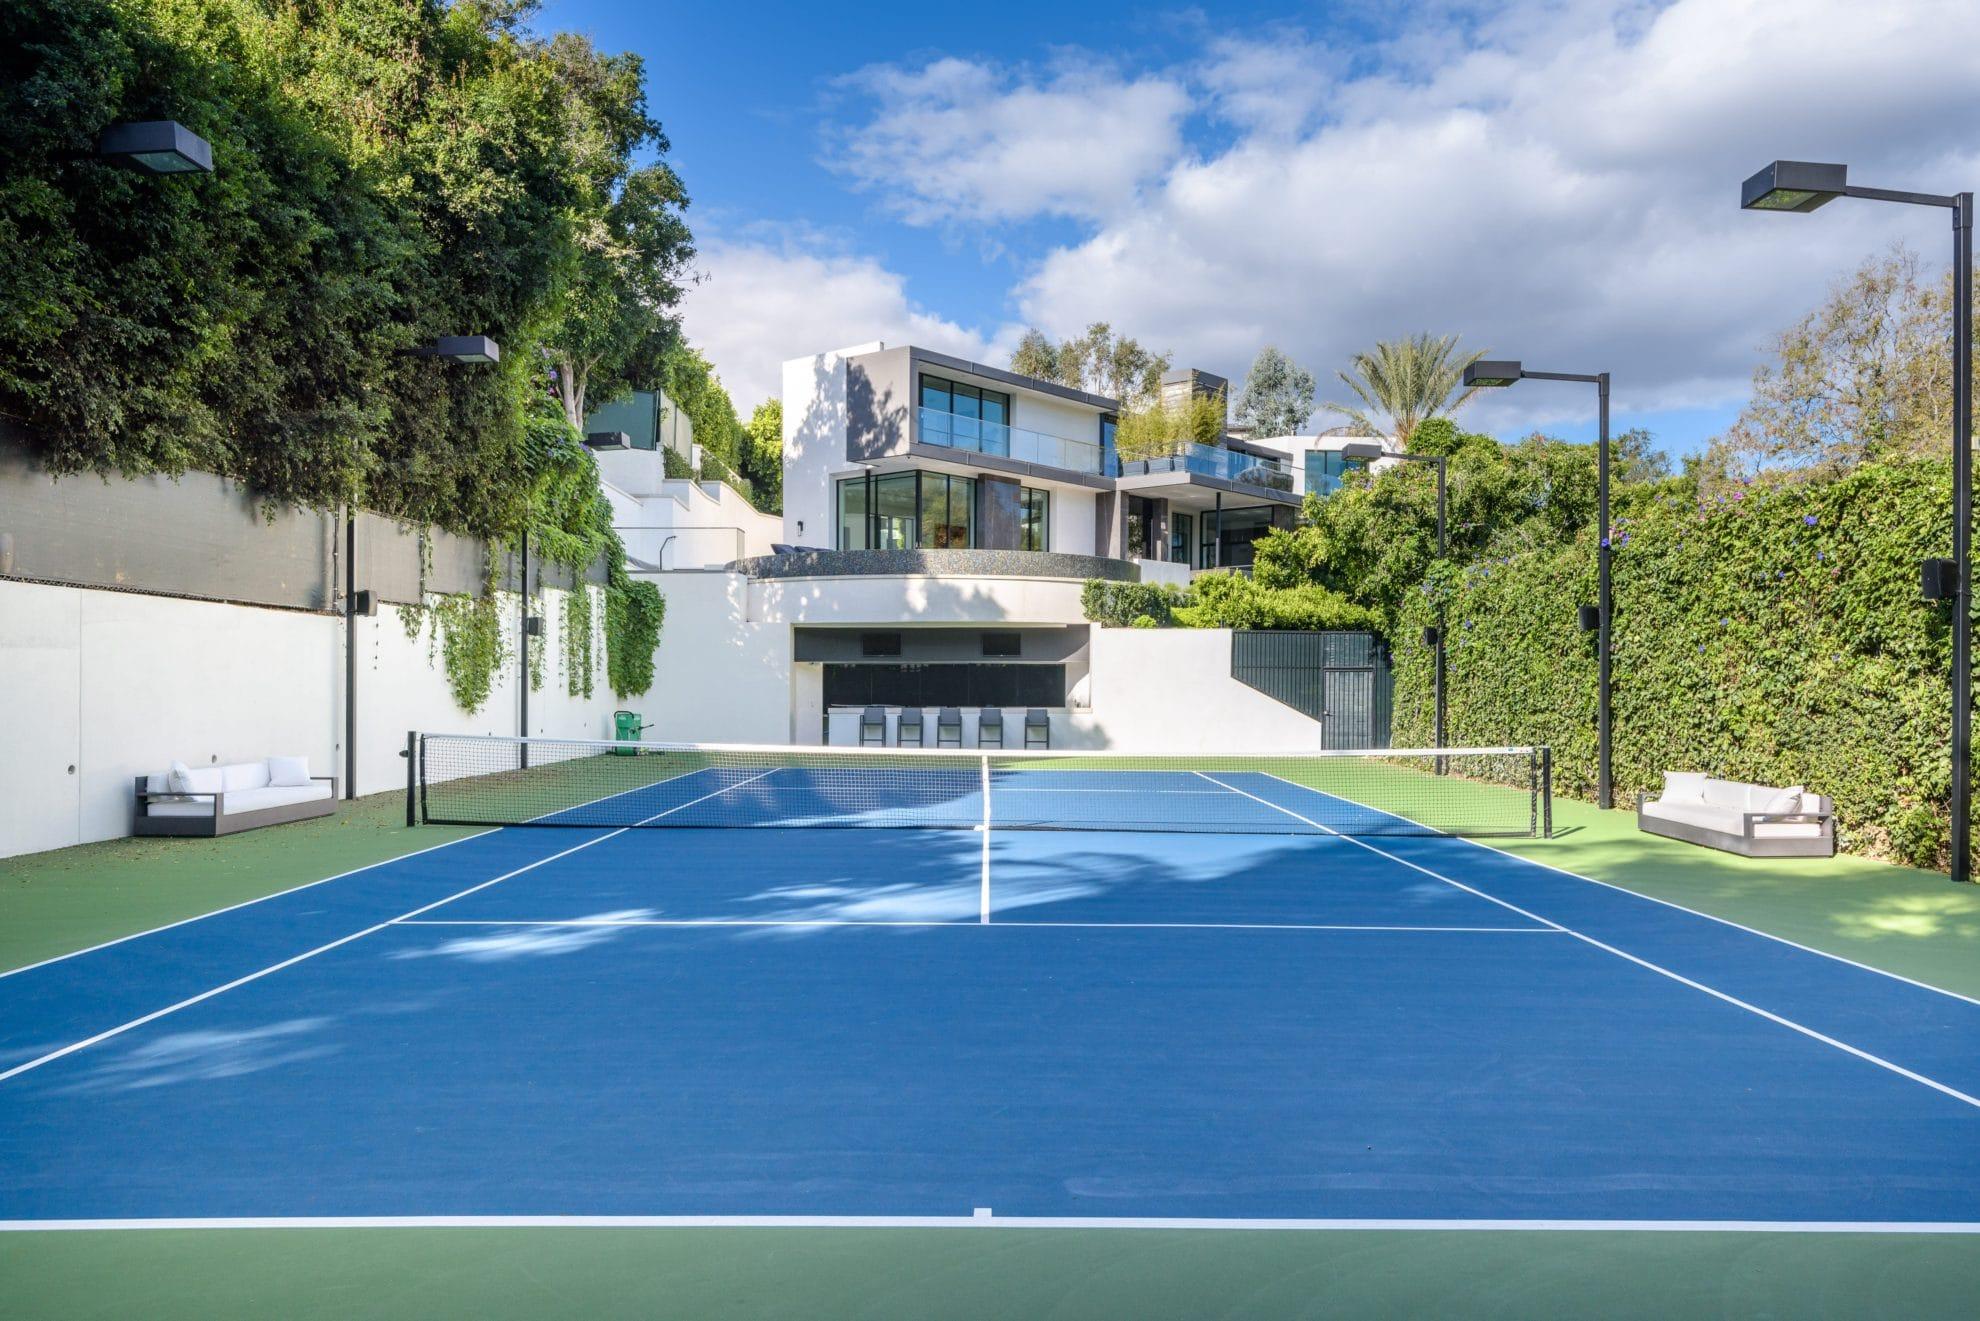 Hanover Way - Tennis Court